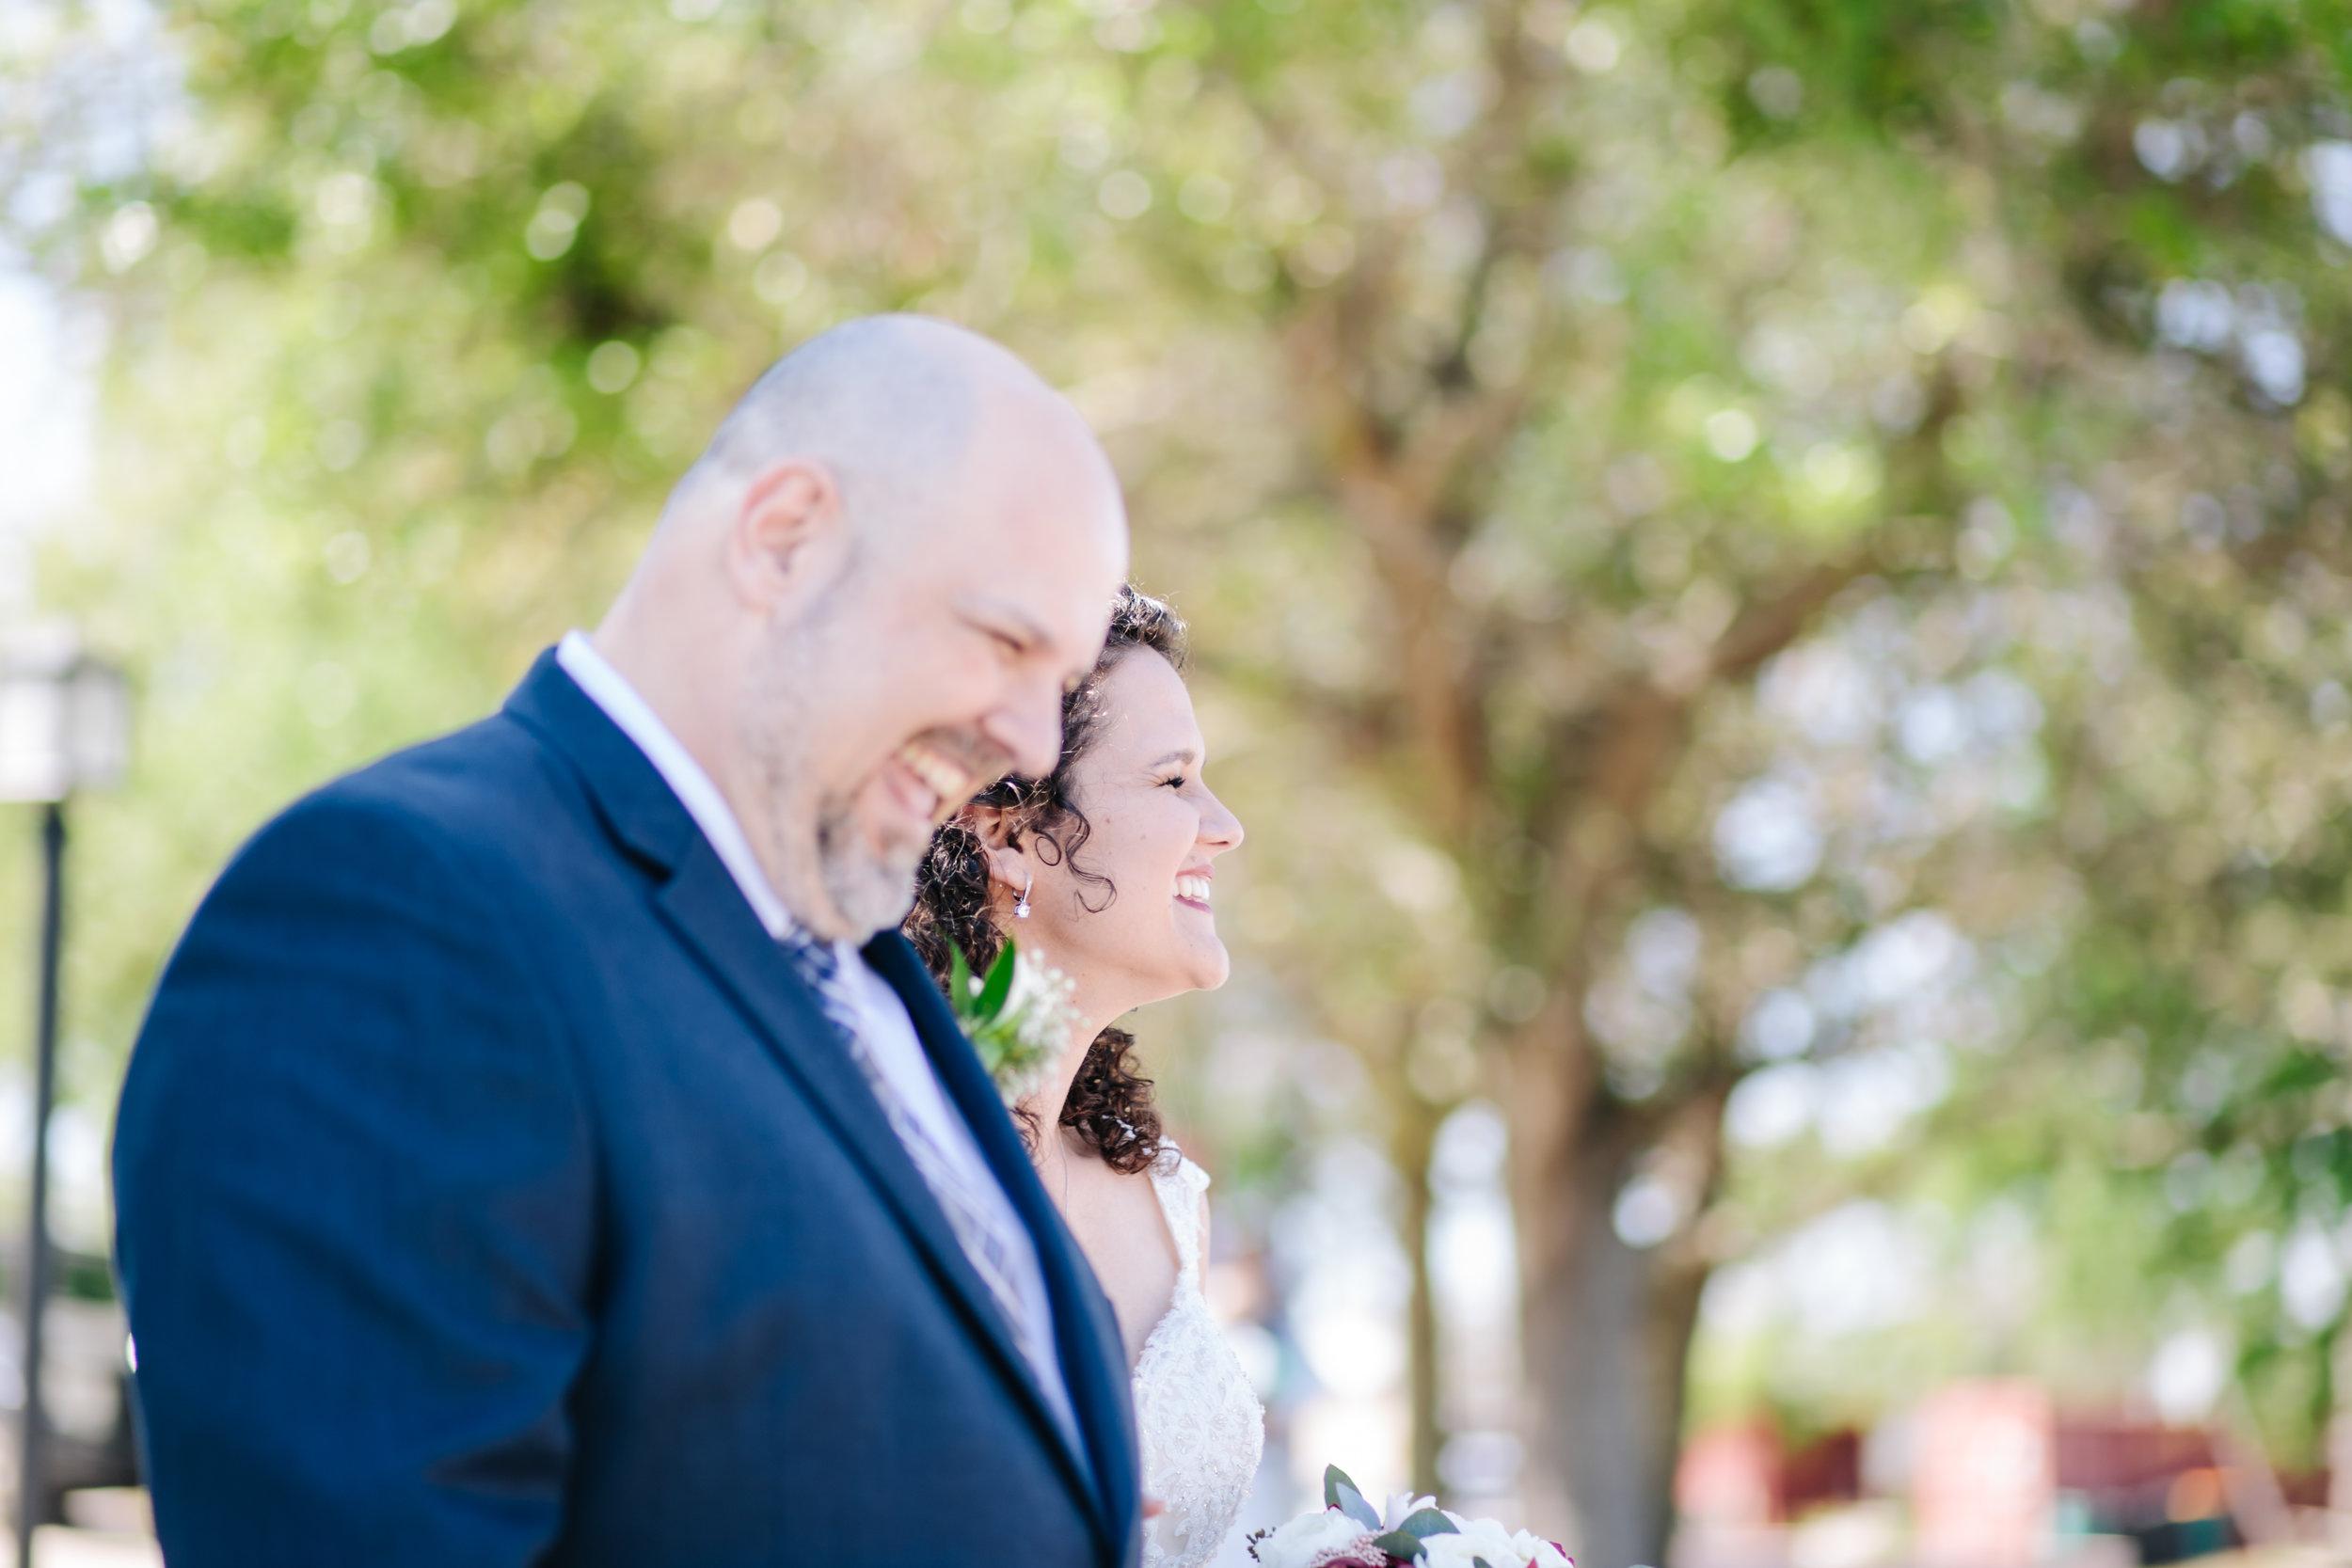 2018.03.17 Allison and Chuck Wedding Waelti Melbourne (236 of 900).jpg